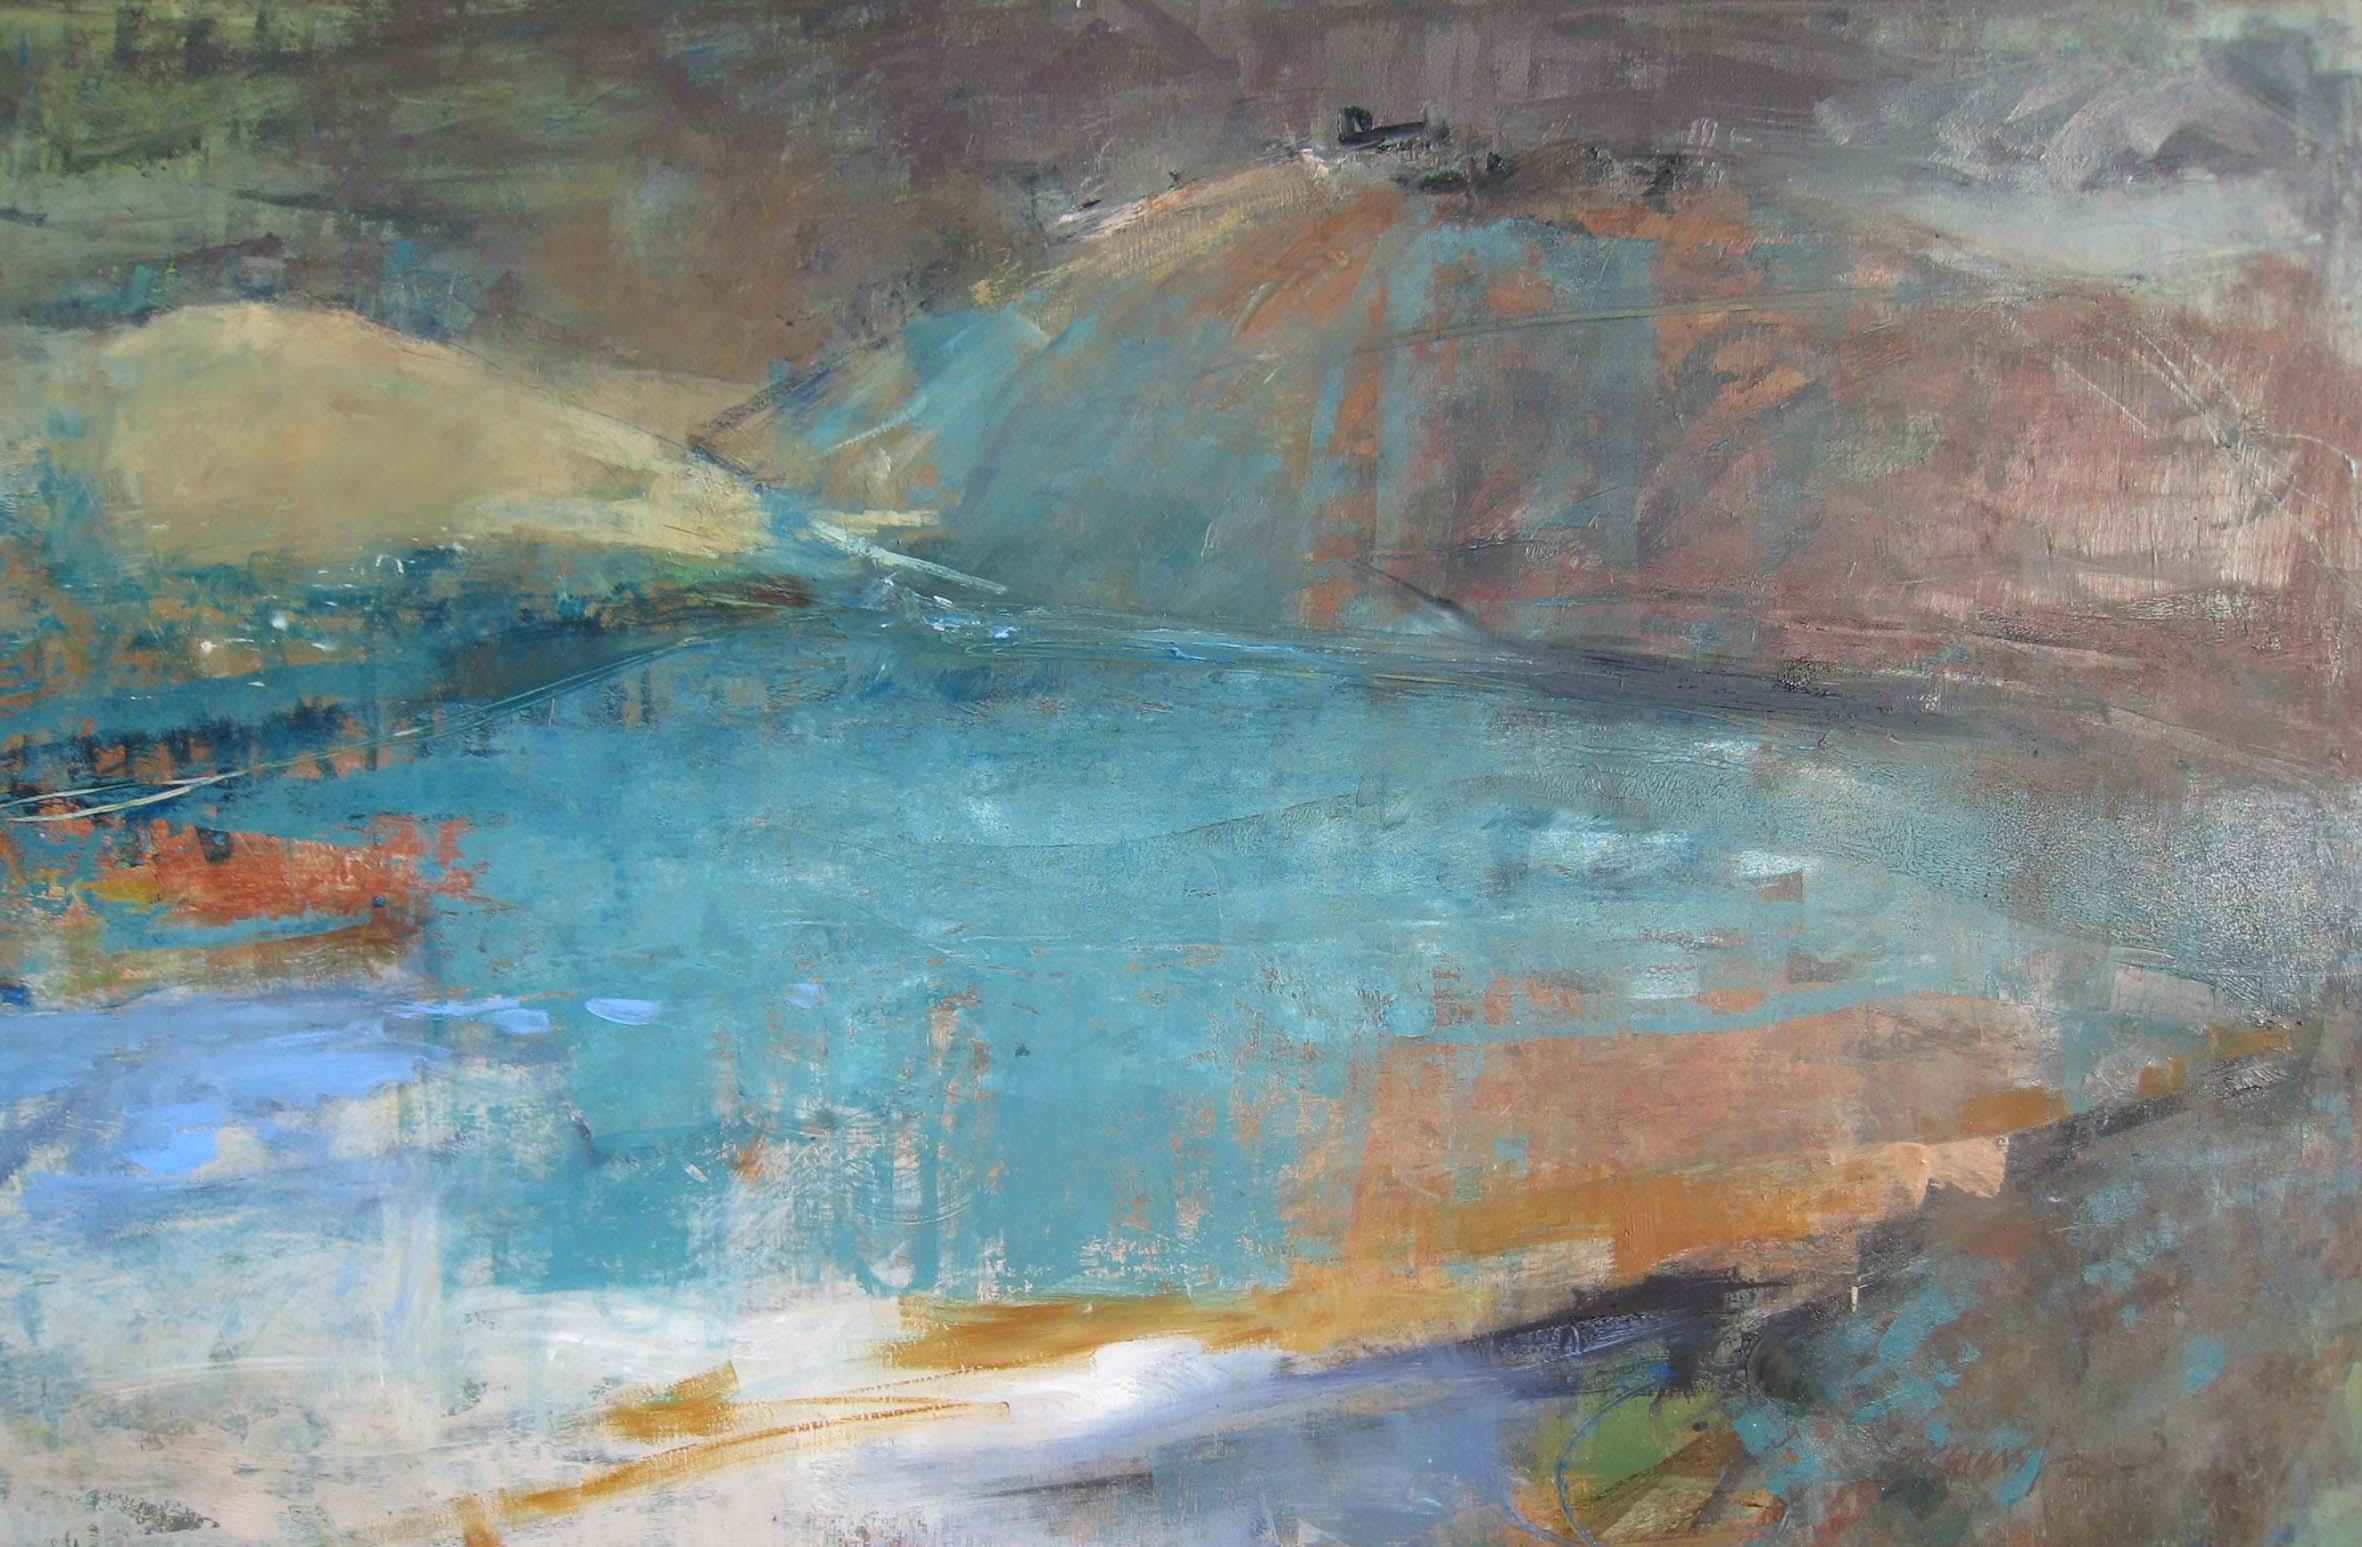 Break in the Storm, Catherine • Sold